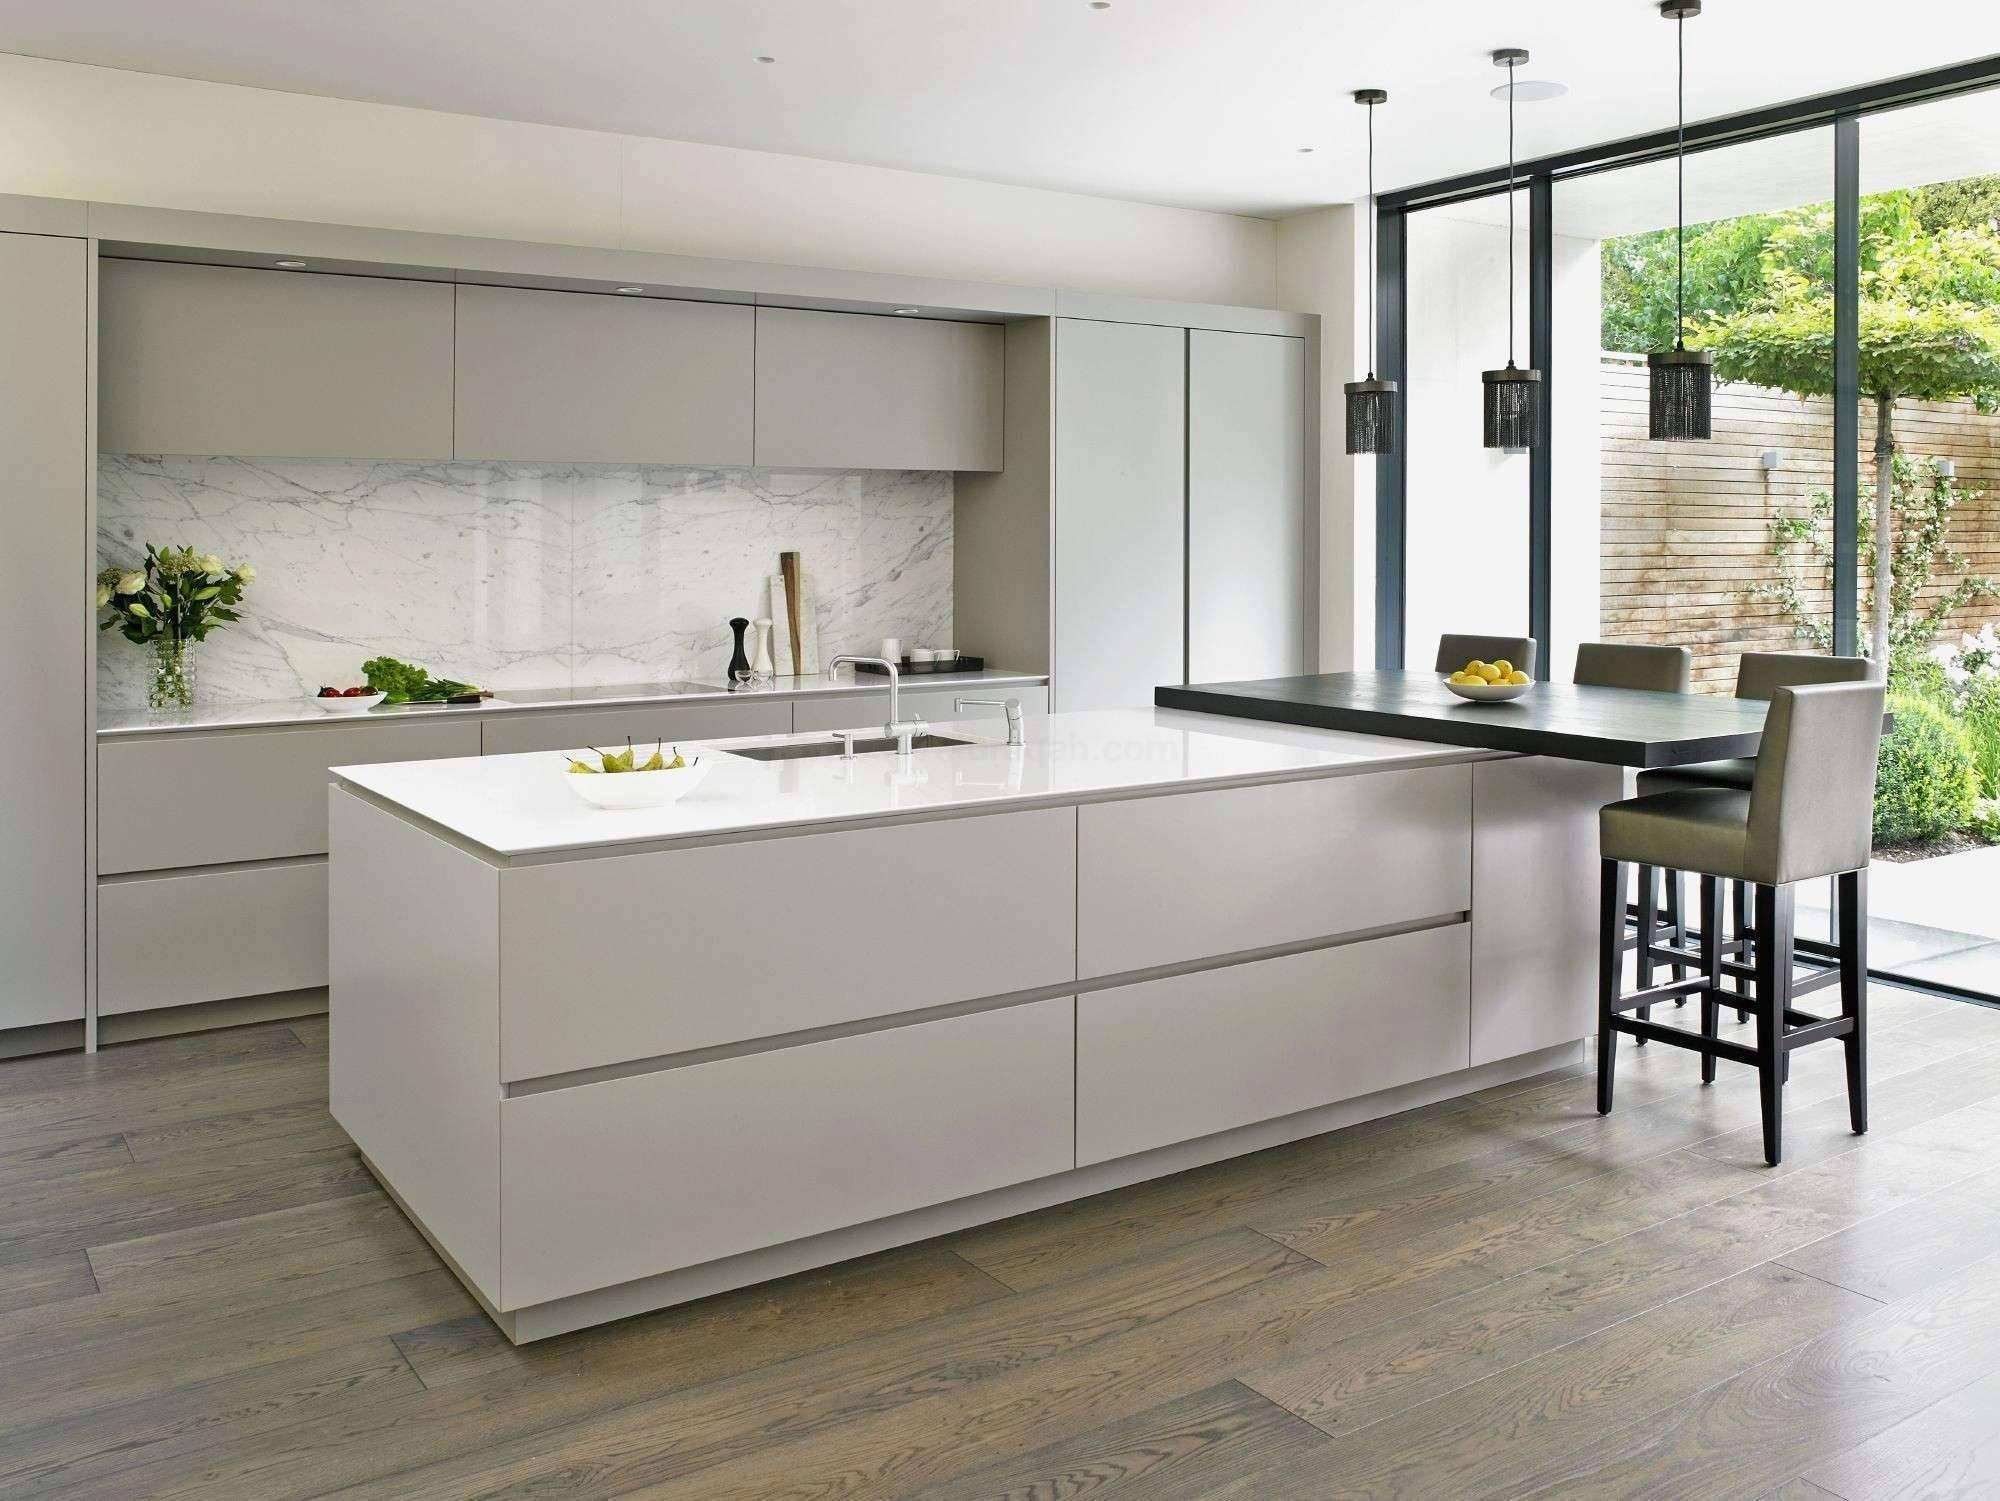 white kitchen ideas on a bud fresh kitchen l kitchen l kitchen 0d kitchens scheme modern kitchen of white kitchen ideas on a bud